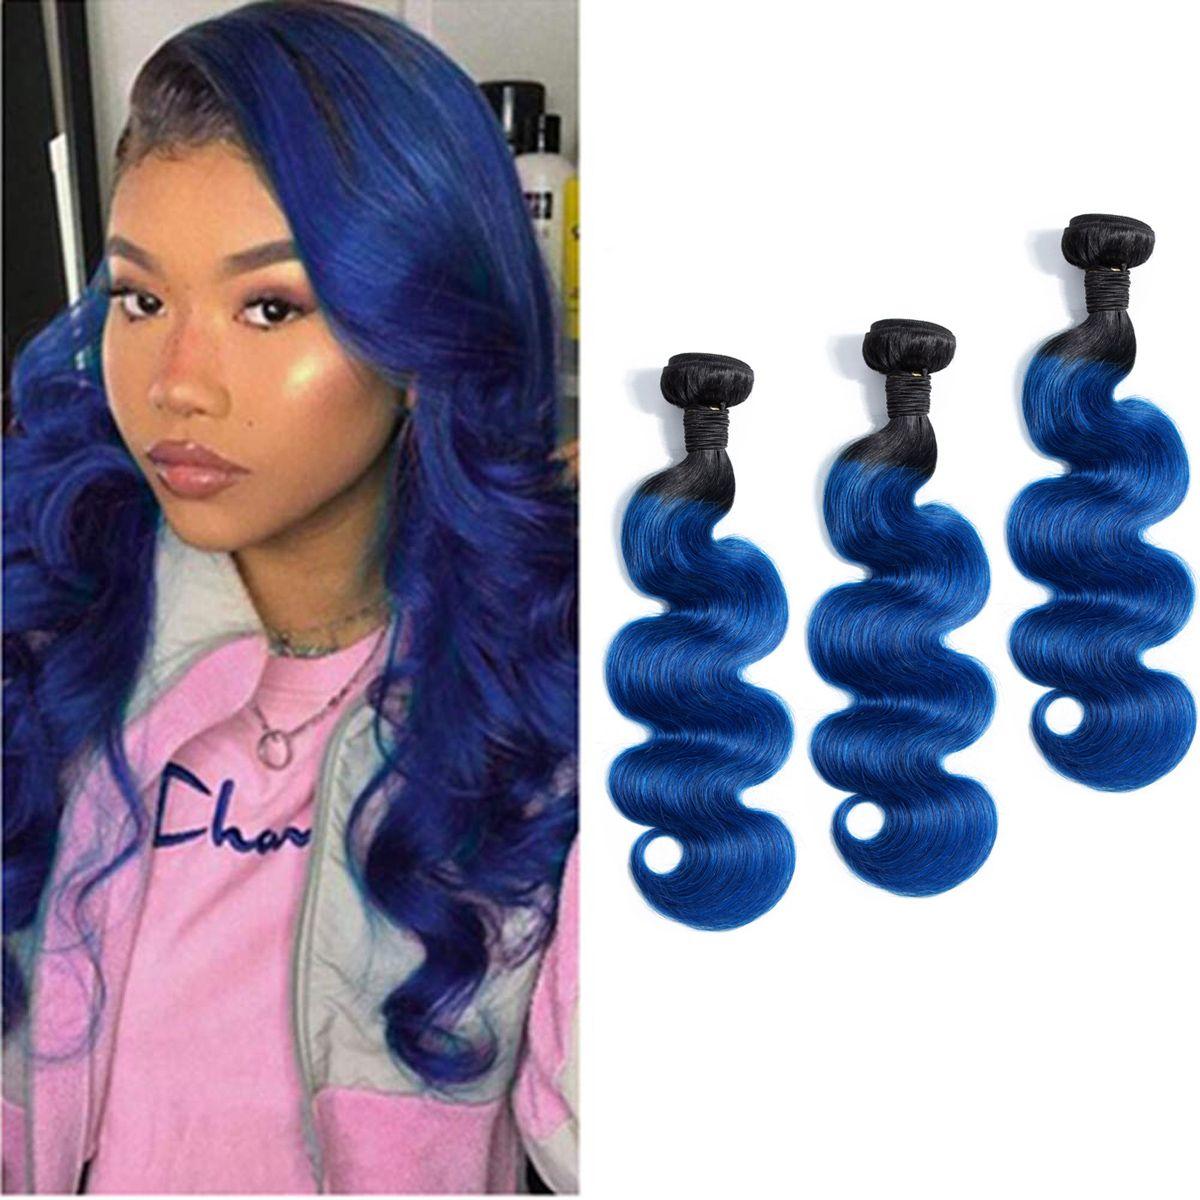 Malaysian Human Hair 1B/Blue Ombre Virgin Hair 3 Bundles Body Wave 1B Blue Hair Extensions 12-28inch